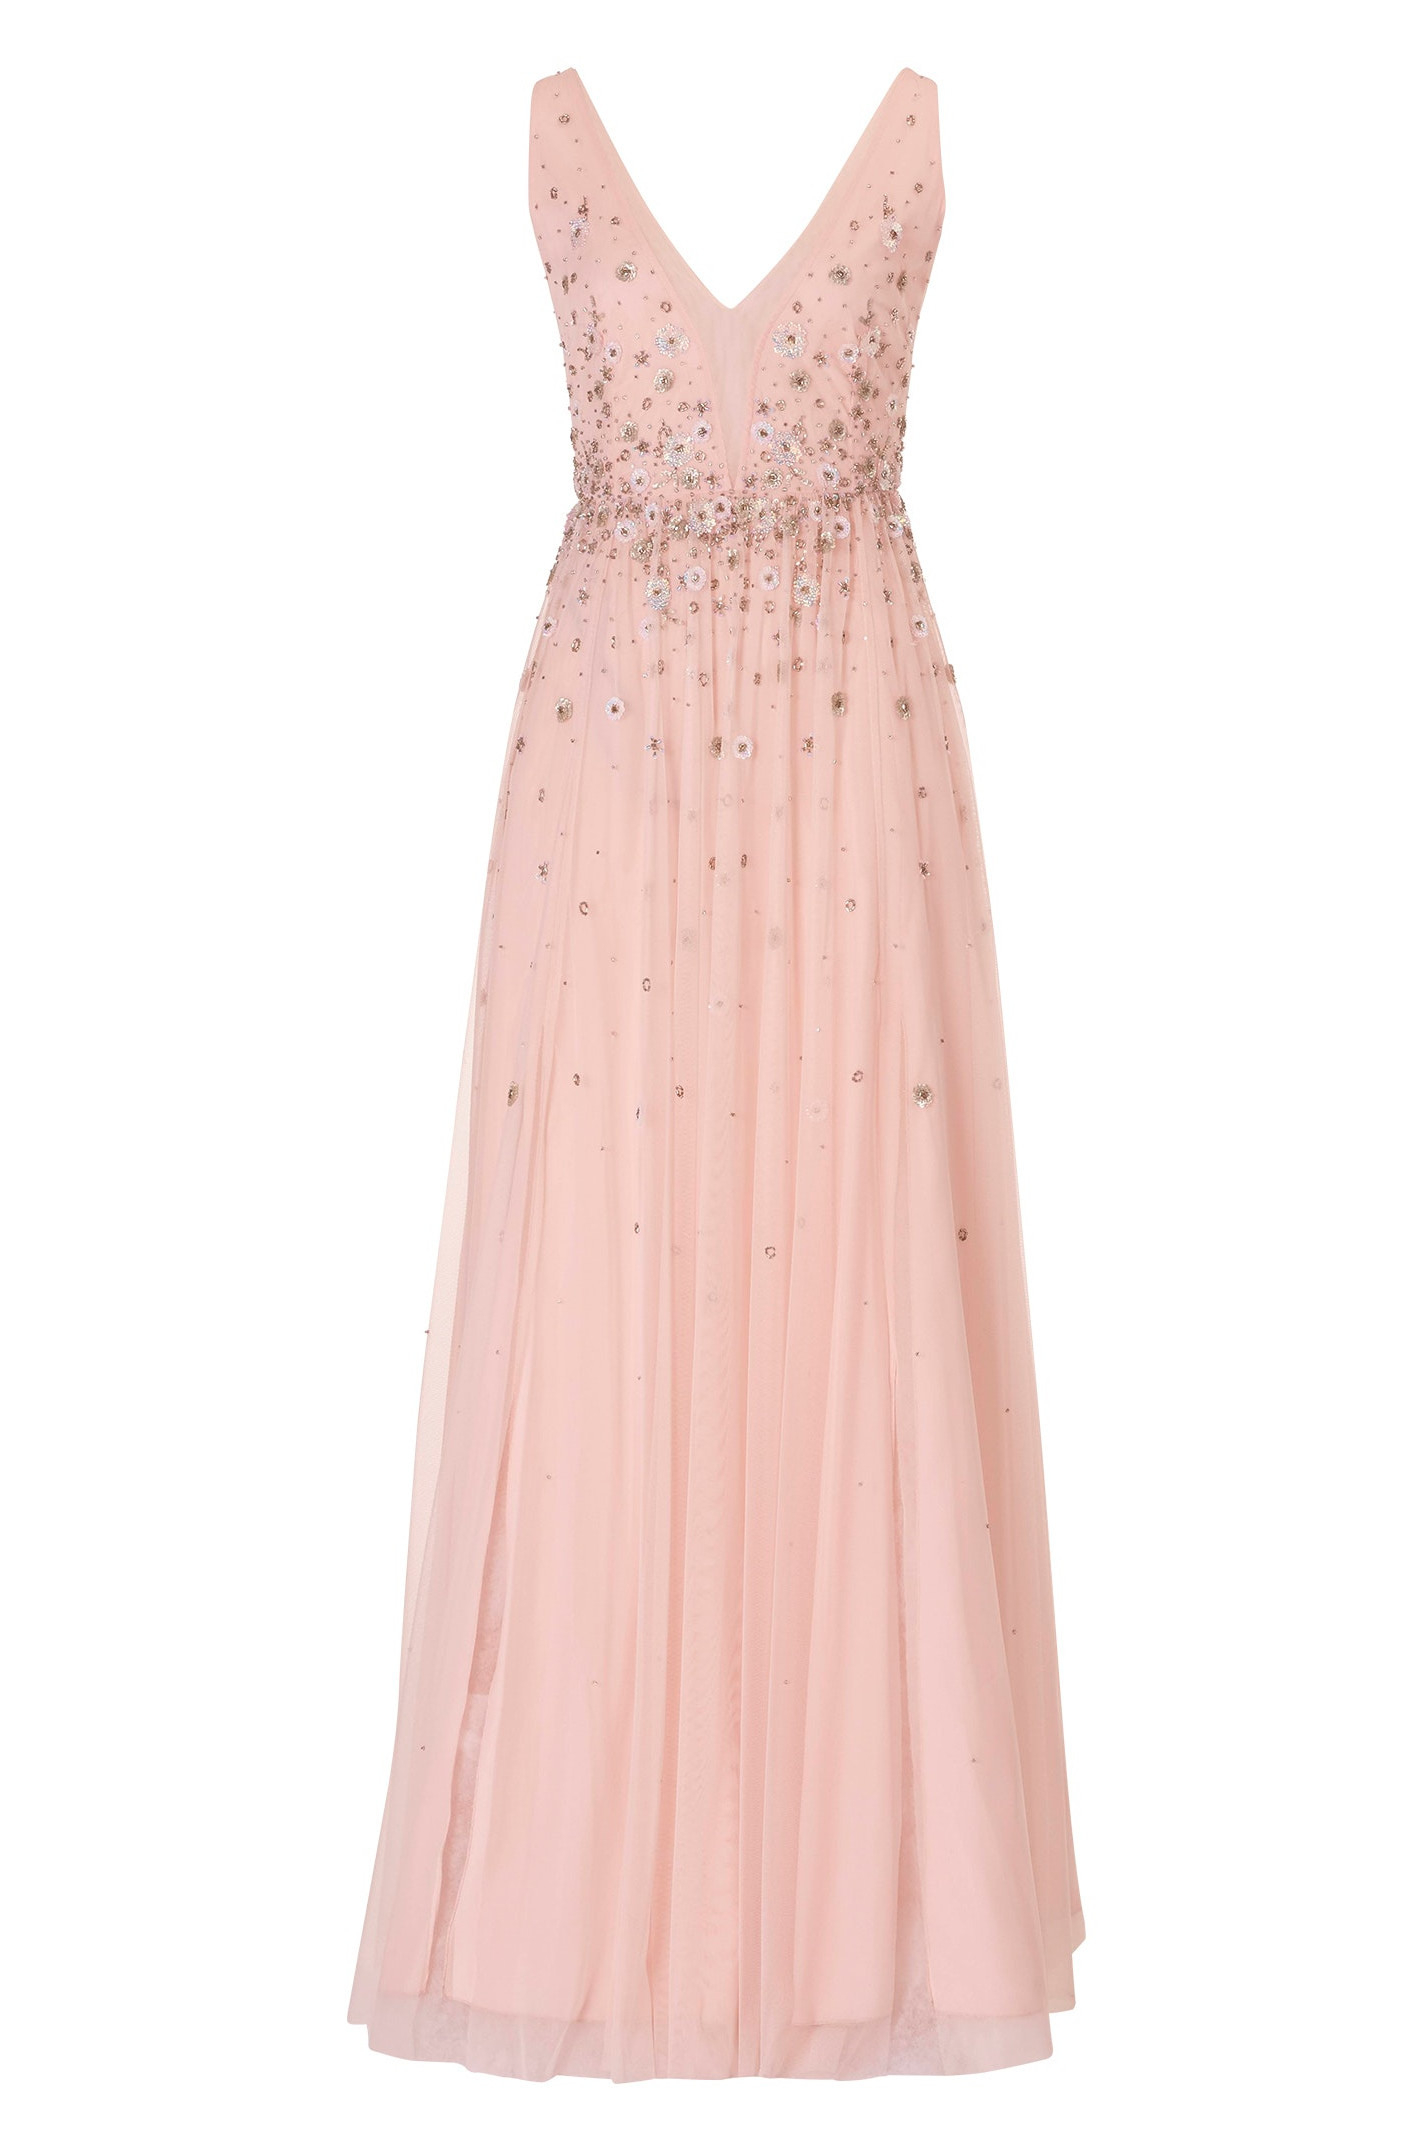 17 Genial Abendkleid für 2019 Coolste Abendkleid Galerie